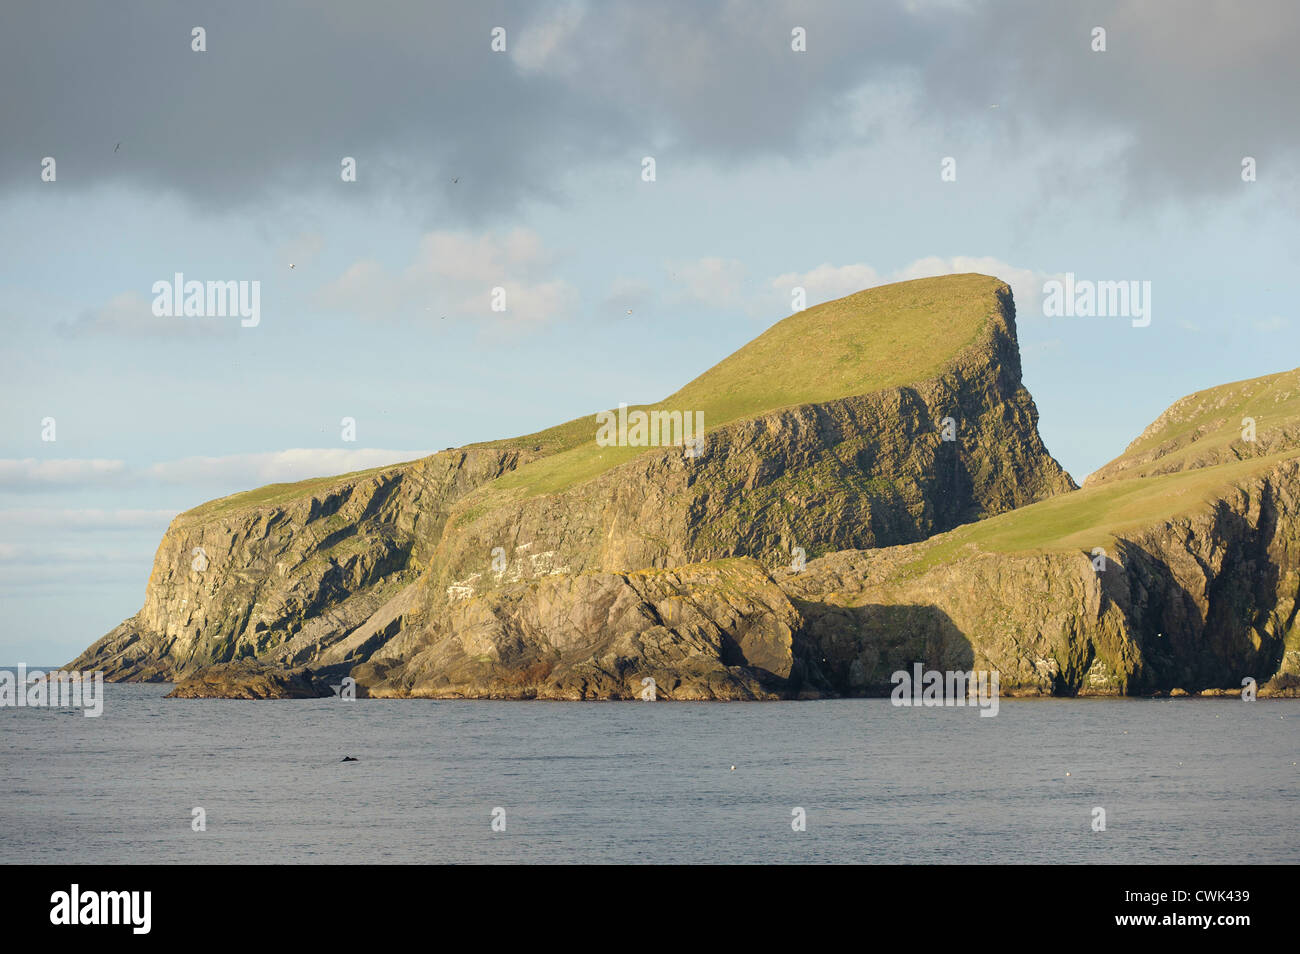 Sheep Craig or Sheep Rock on Fair in the Shetland Islands. June 2012. - Stock Image